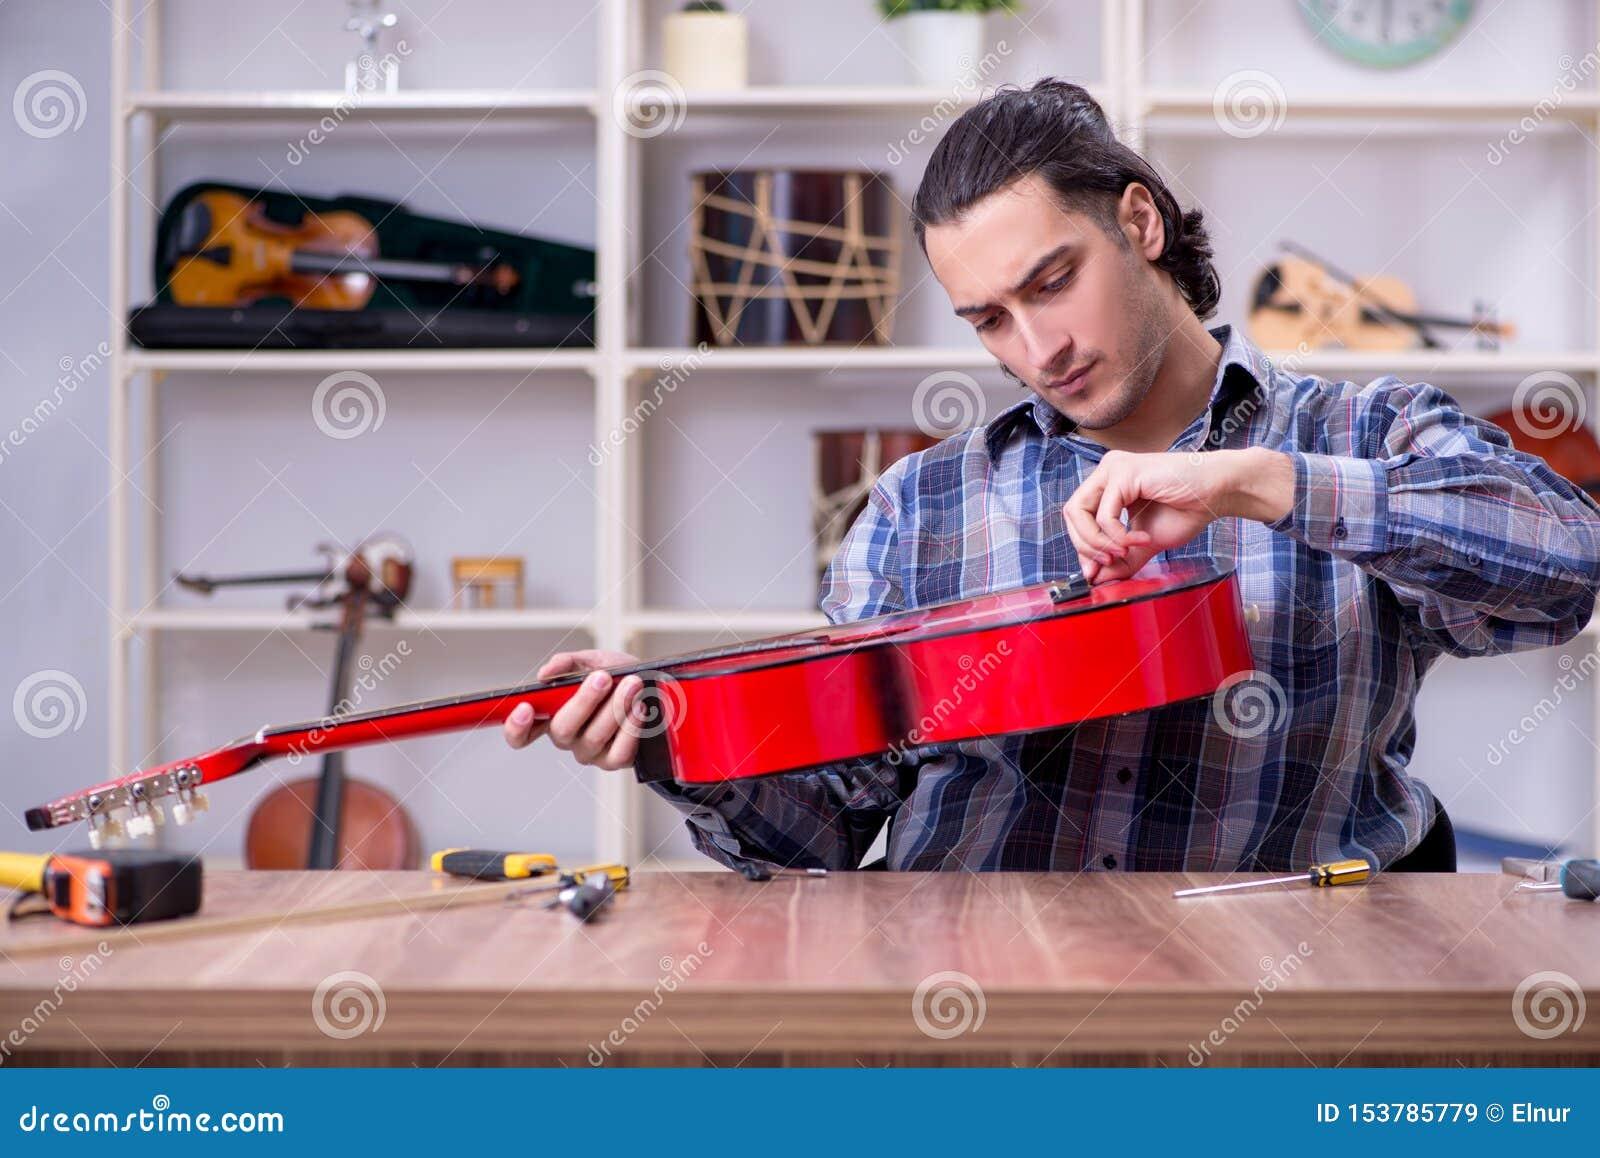 Jonge knappe hersteller die gitaar herstellen